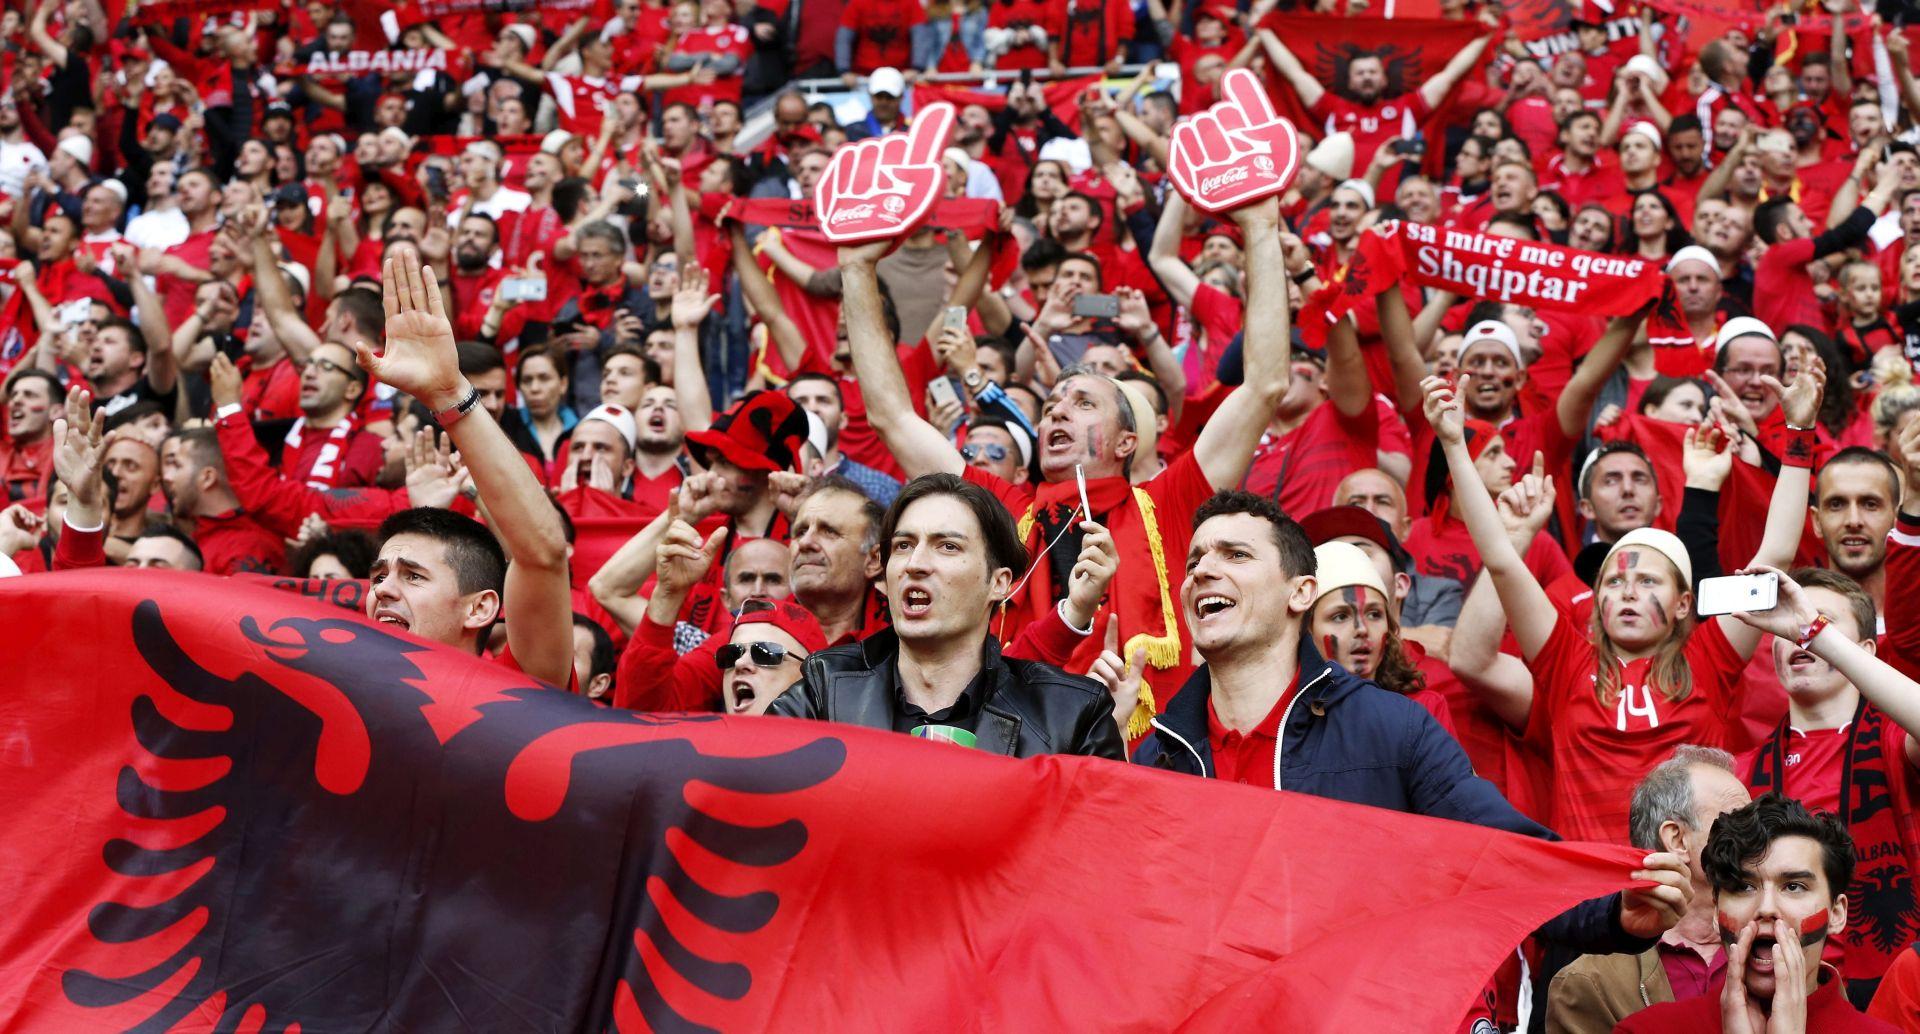 VIDEO: Tirana albanske reprezentativce dočekala kao heroje